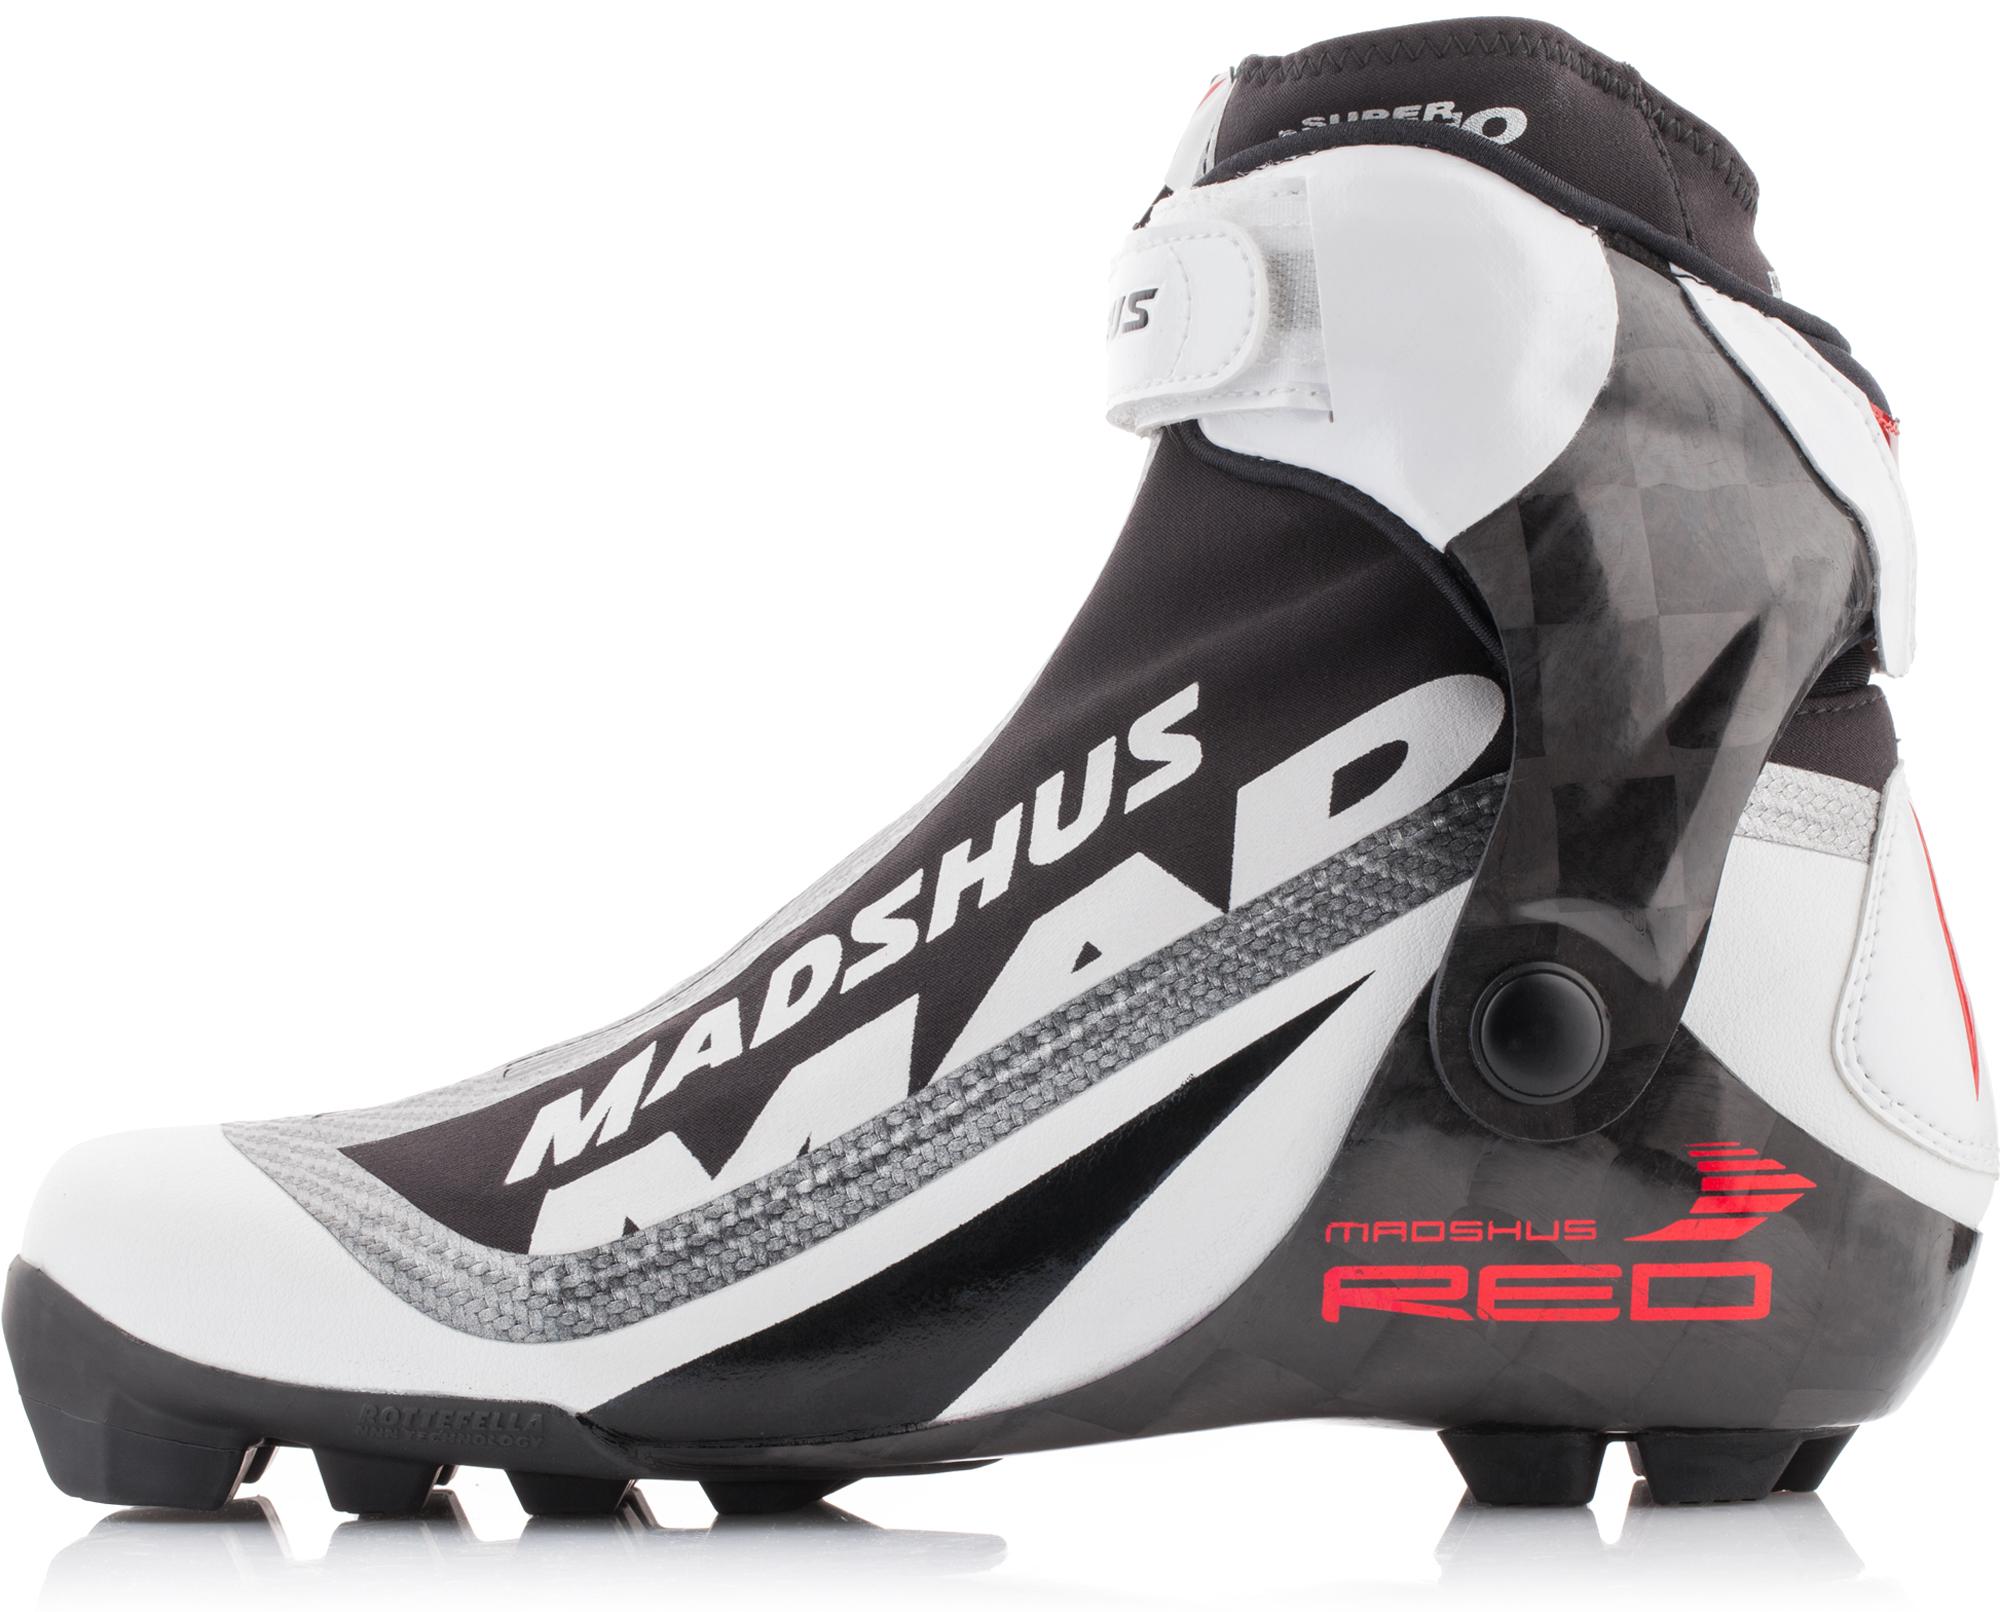 Madshus Ботинки для беговых лыж Madshus Super Nano Skate, размер 45 цена